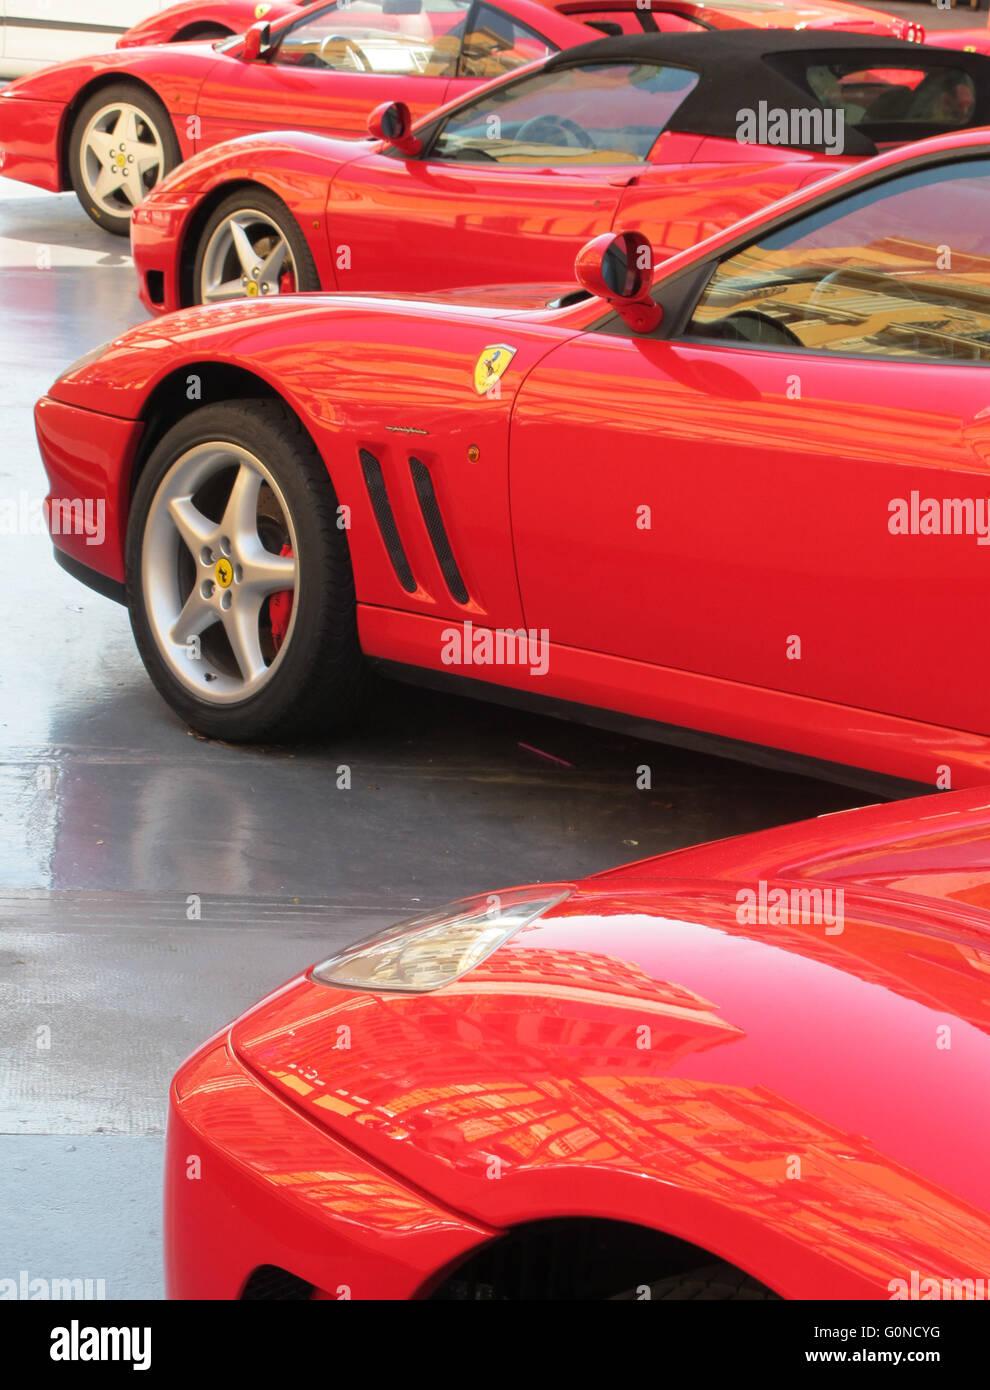 Ferrari Dealership Nc >> Ferrari Dealership Car Stock Photos Ferrari Dealership Car